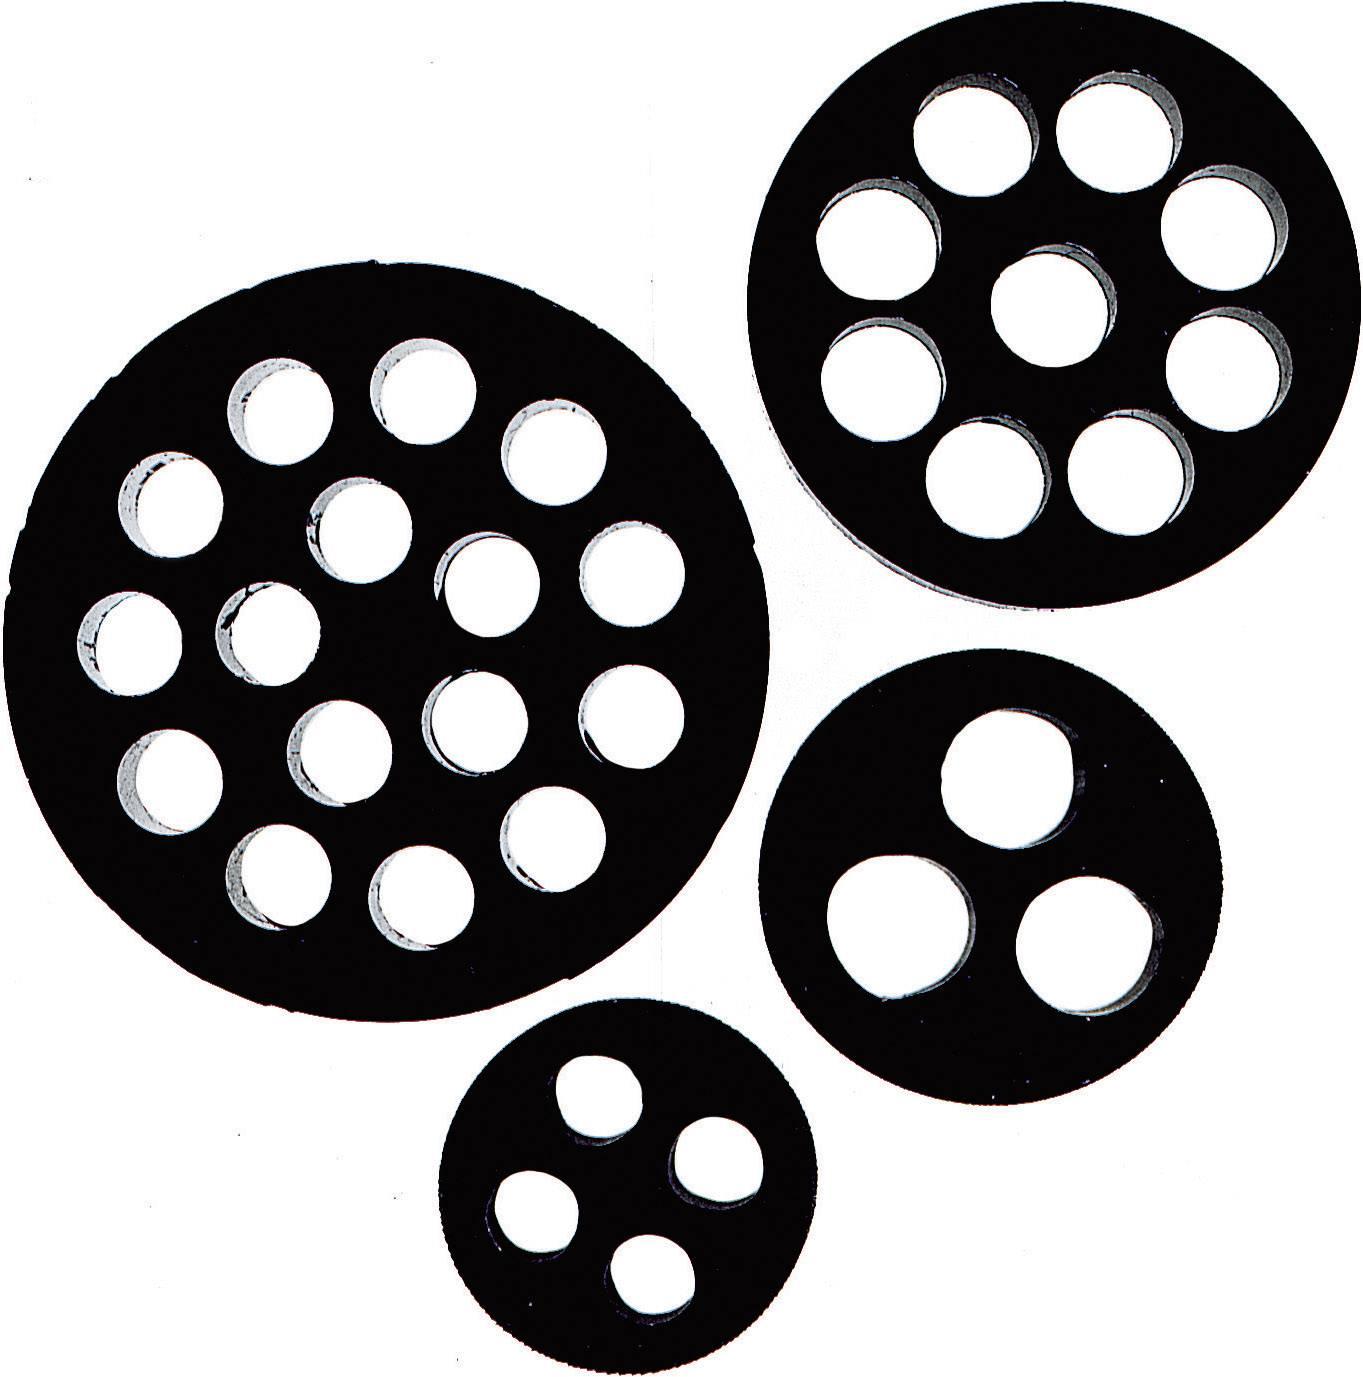 Tesniaca vložka s viacerými priechodmi LappKabel SKINTOP® DIX-M32, M32, nitril kaučuk, 1 ks